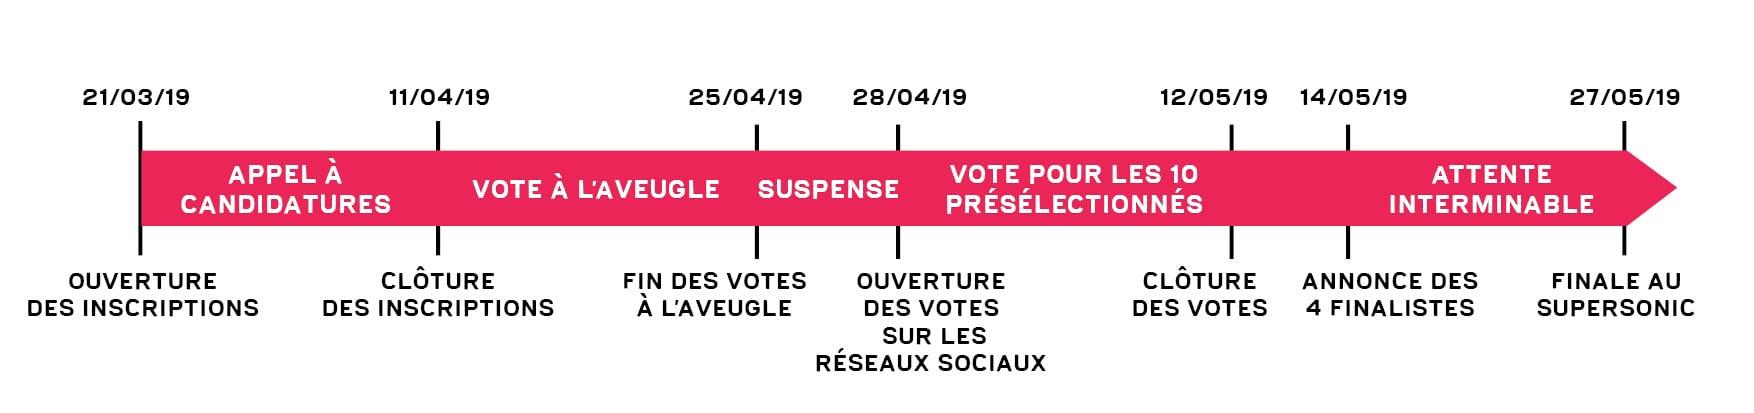 https://cdn2.szigetfestival.com/cdf5bn/f851/fr/media/2019/03/frise_tremplin_rouge_27_mai.jpg